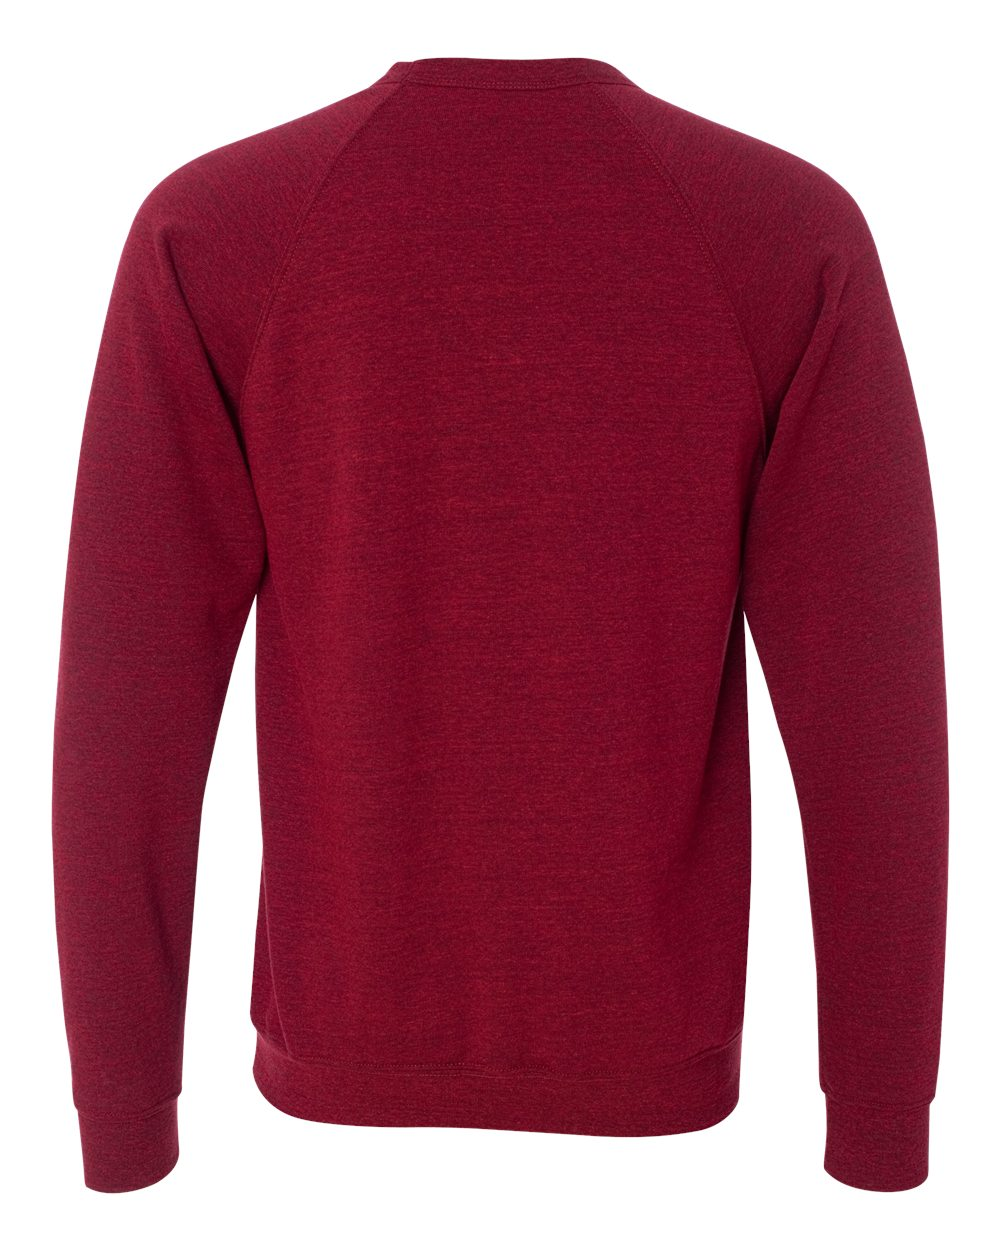 Bella-Canvas-Unisex-Sponge-Fleece-Crewneck-Sweatshirt-Top-Blank-3901-up-to-2XL thumbnail 19